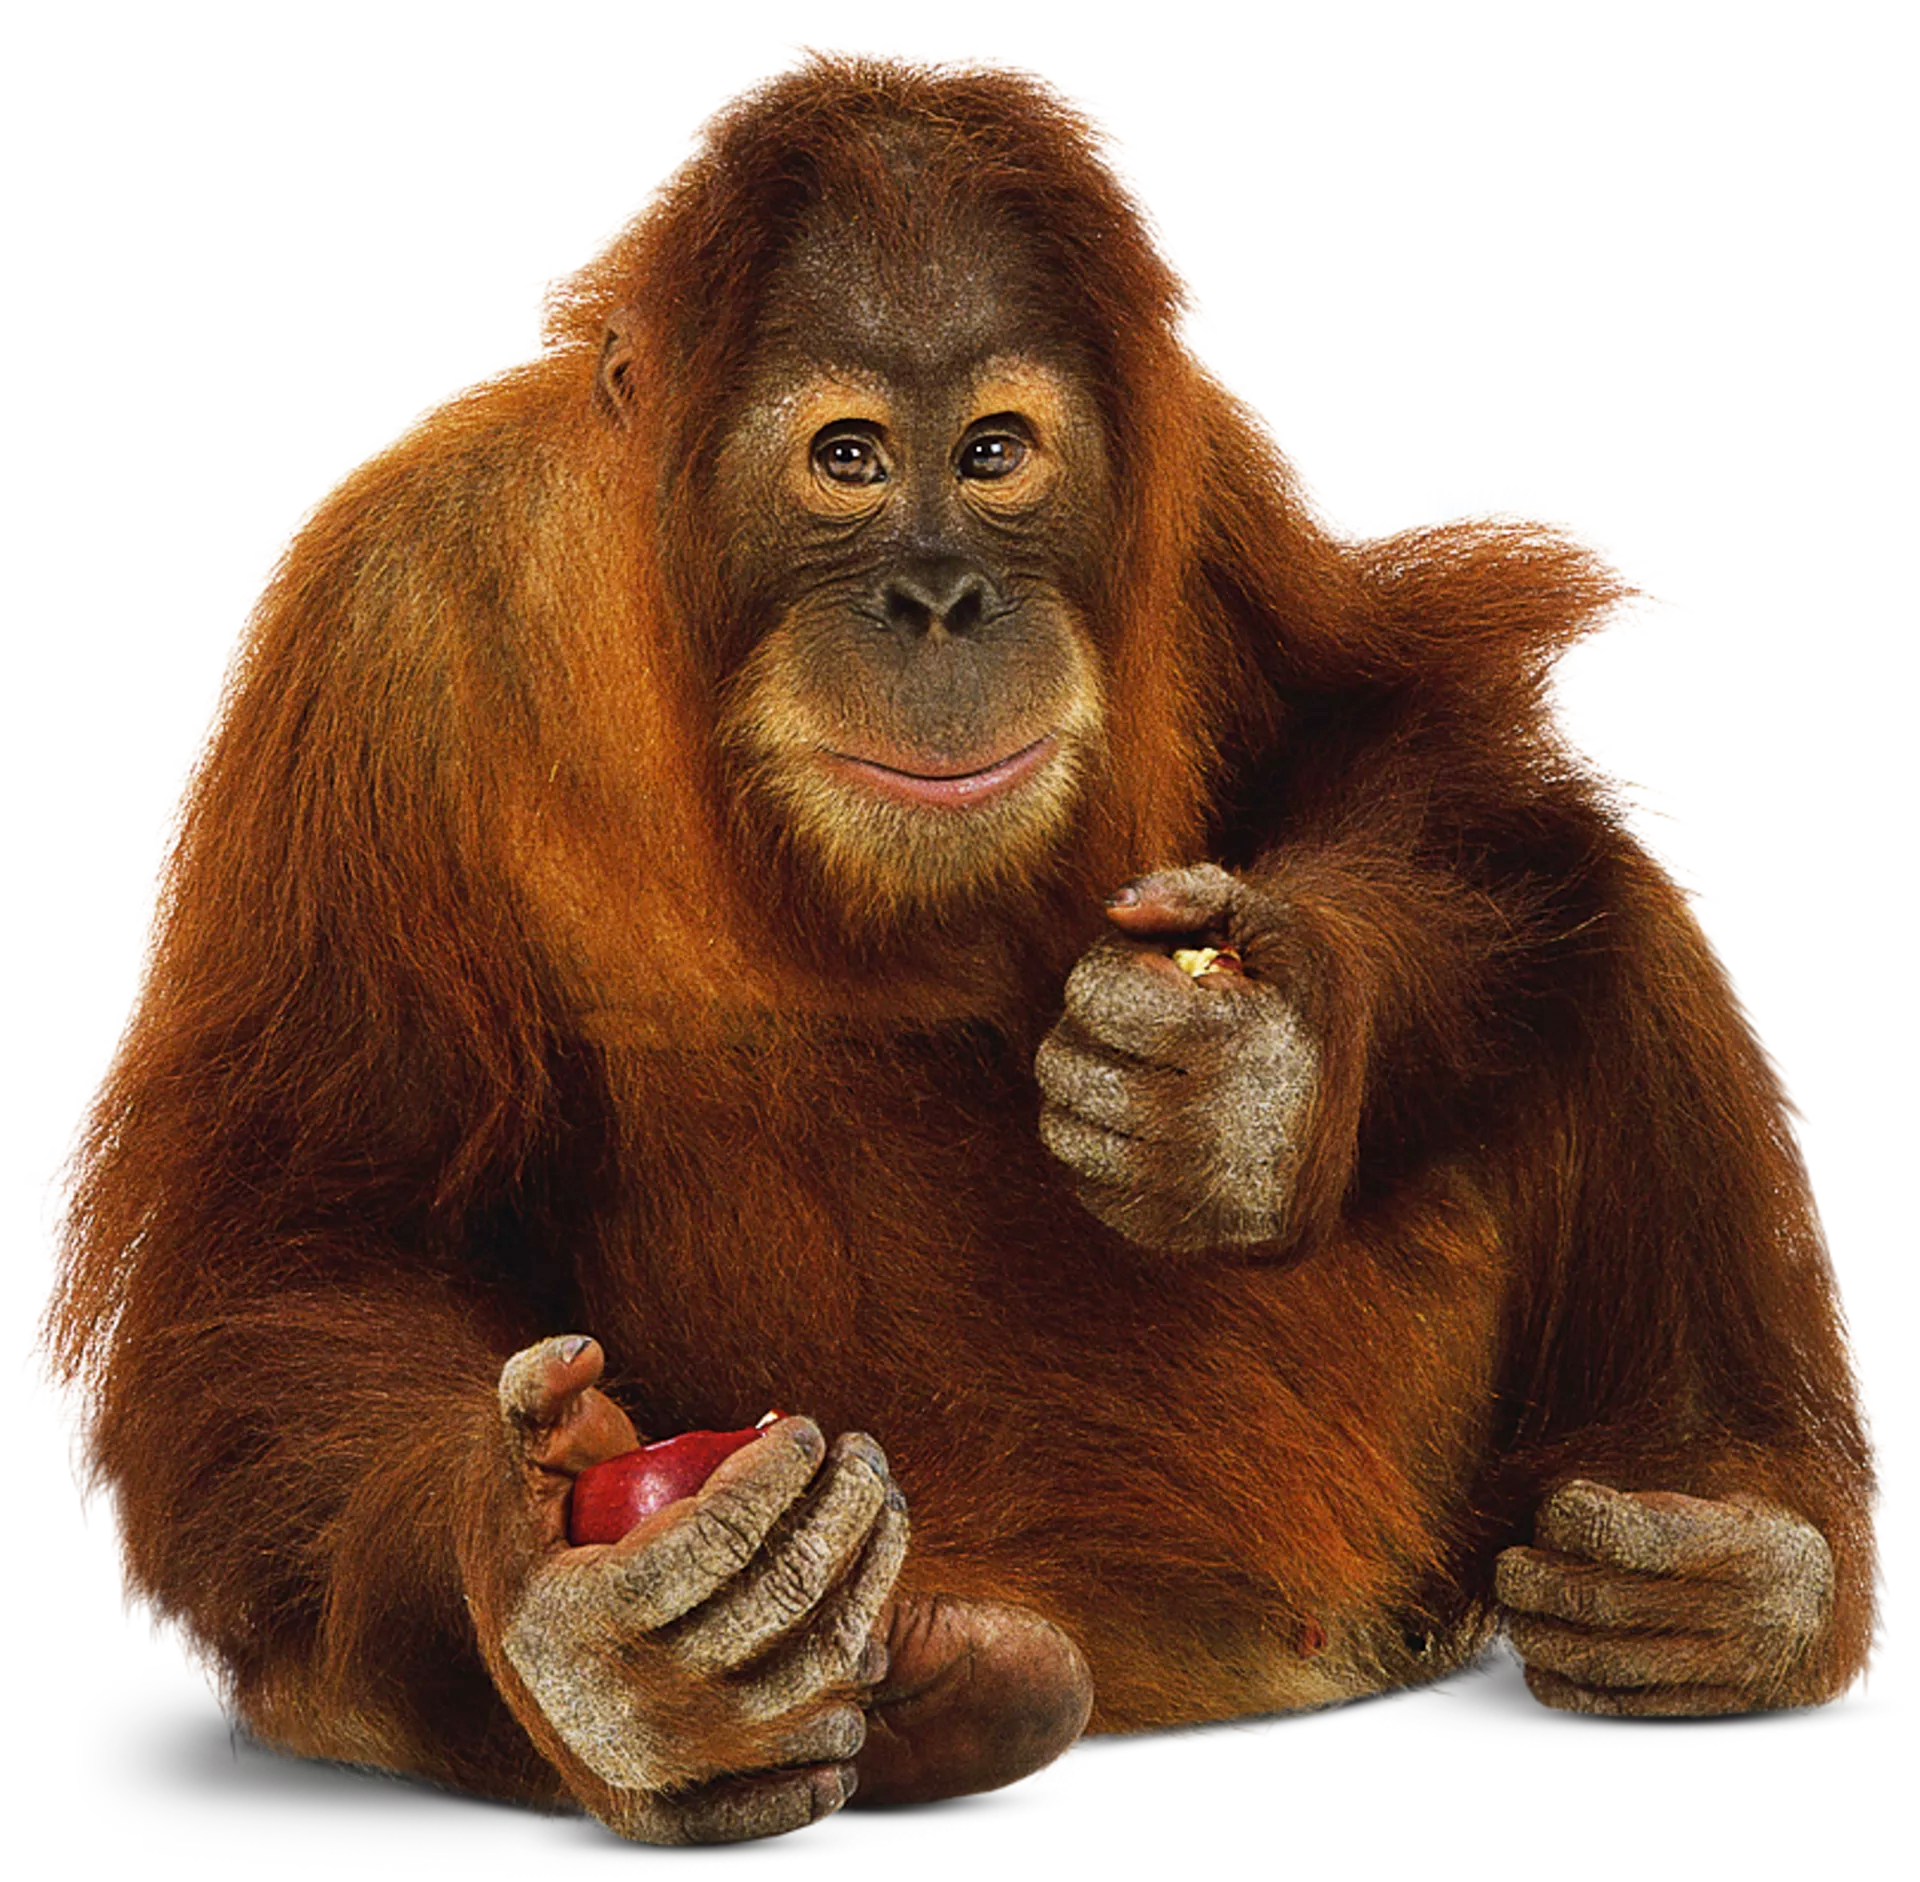 Orangutan Facts For Kids